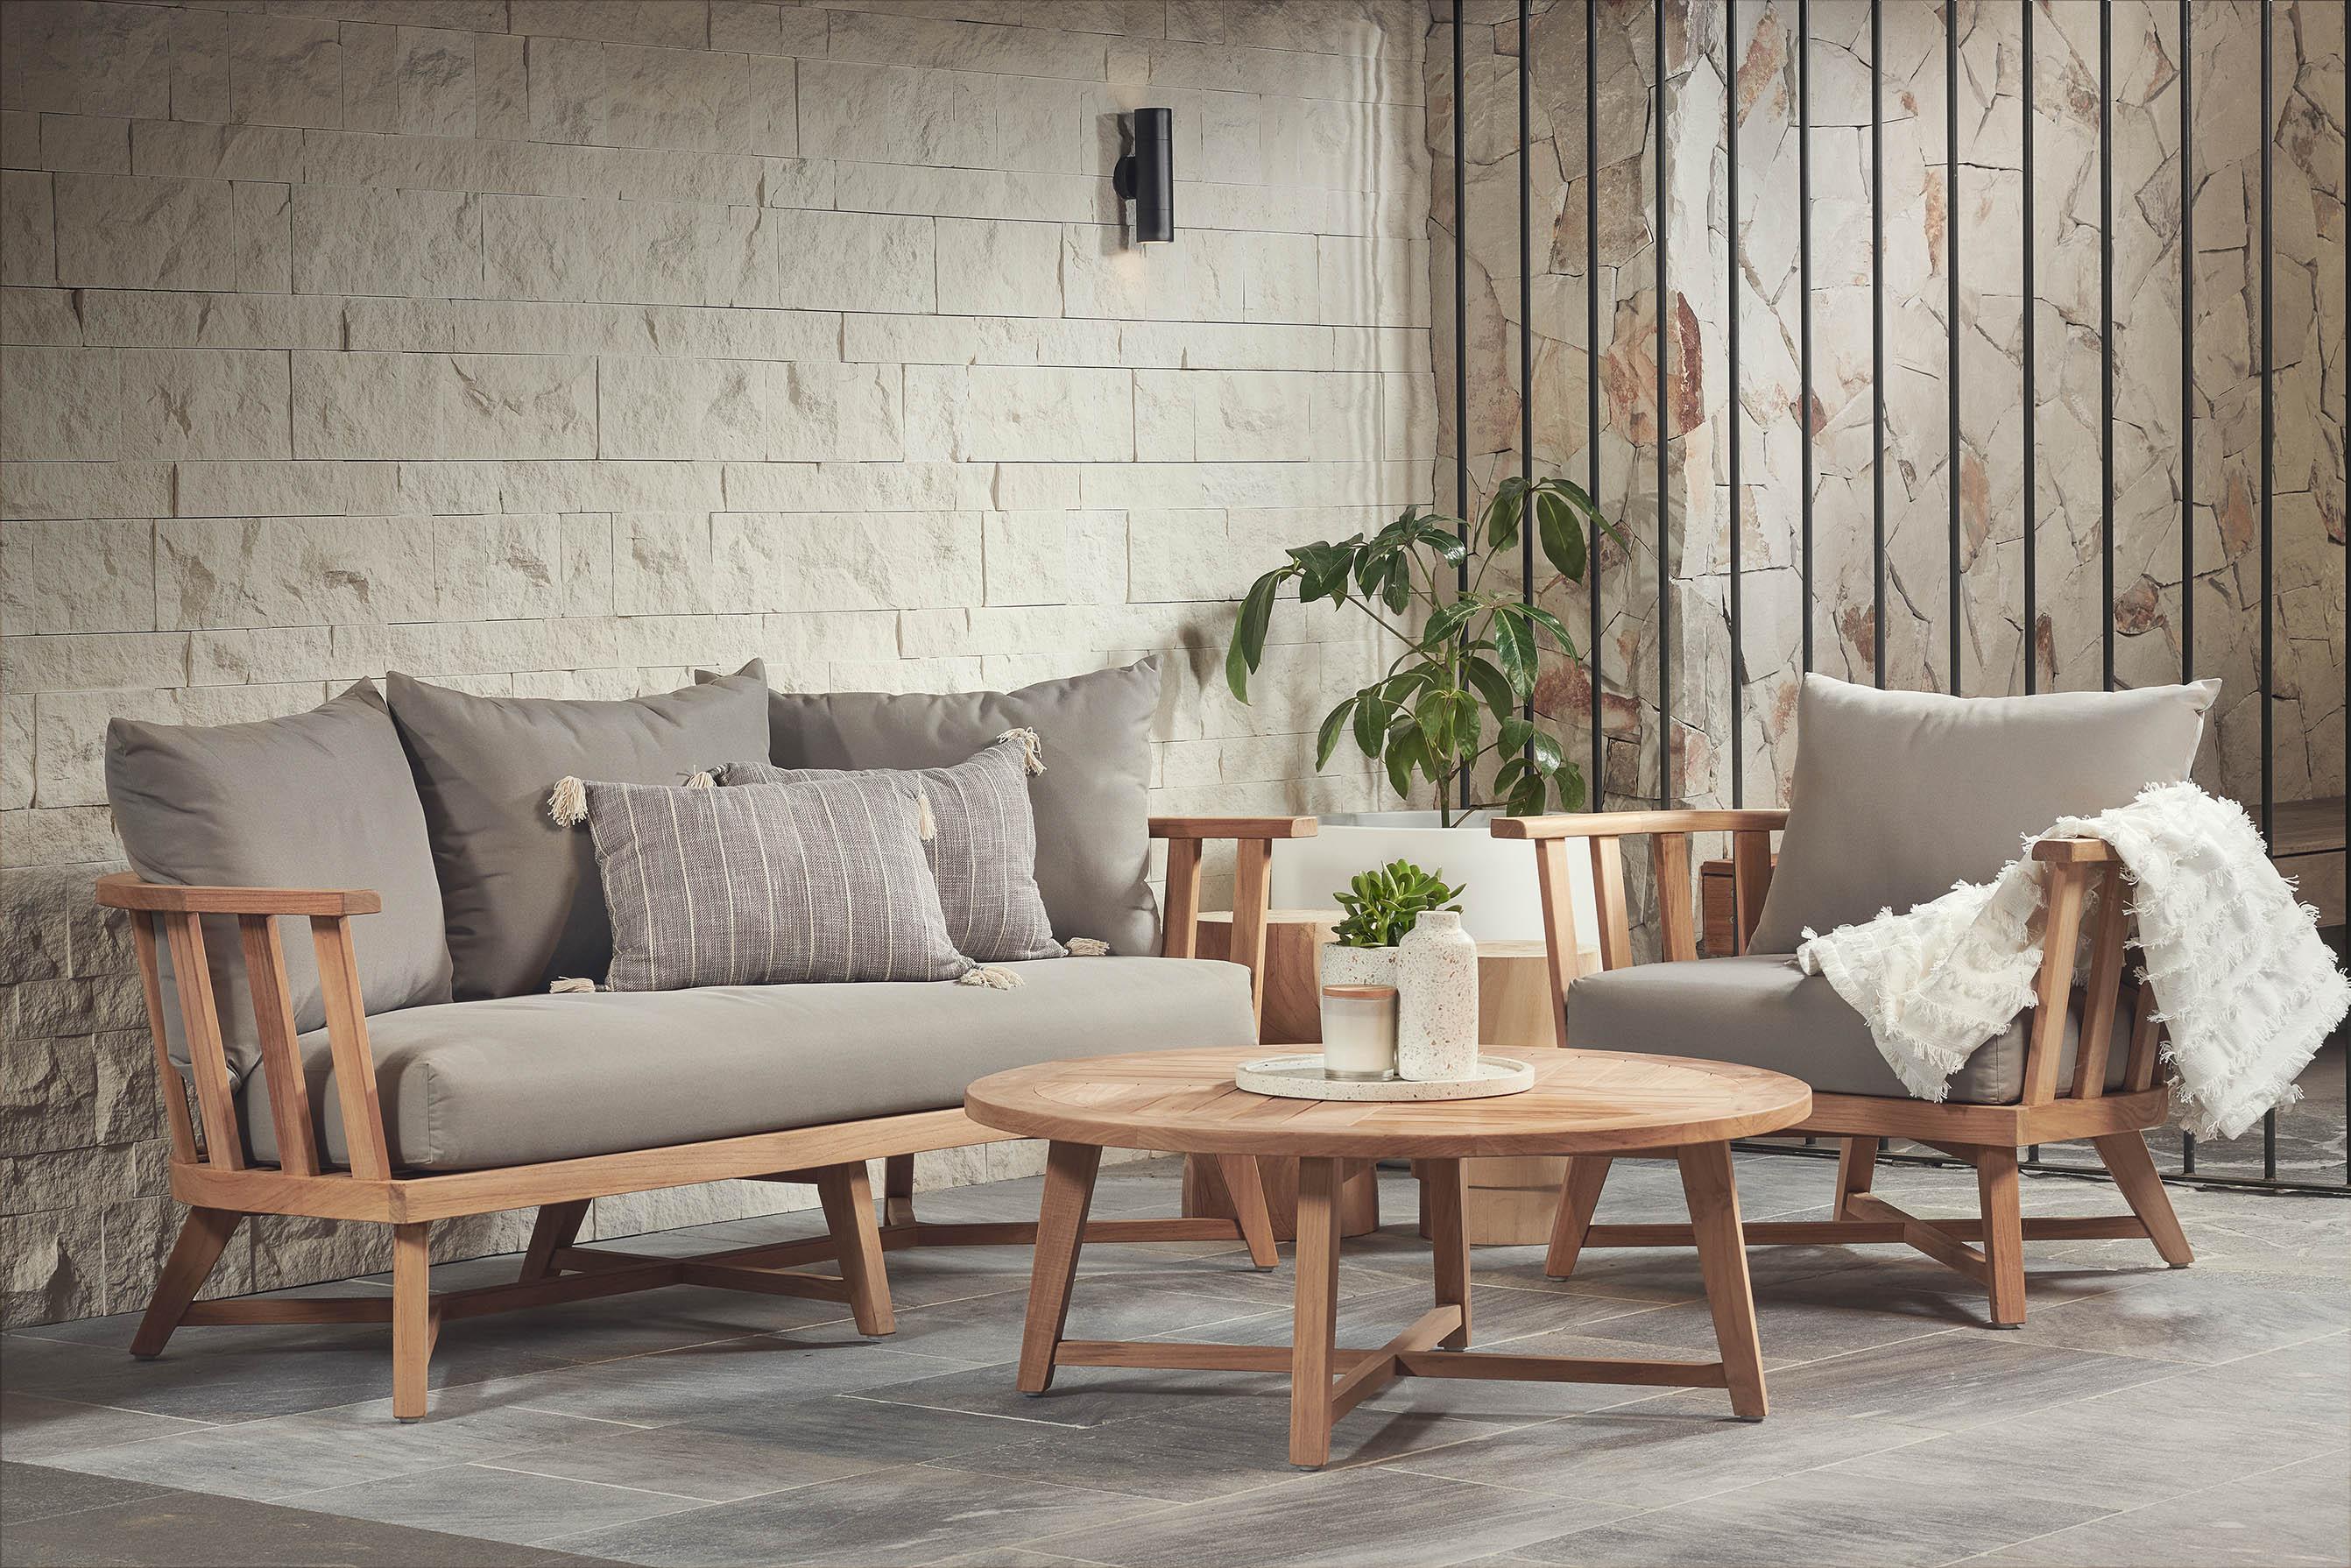 Furniture Gallery Sofas sonoma-slat-three-seater-sofa-00